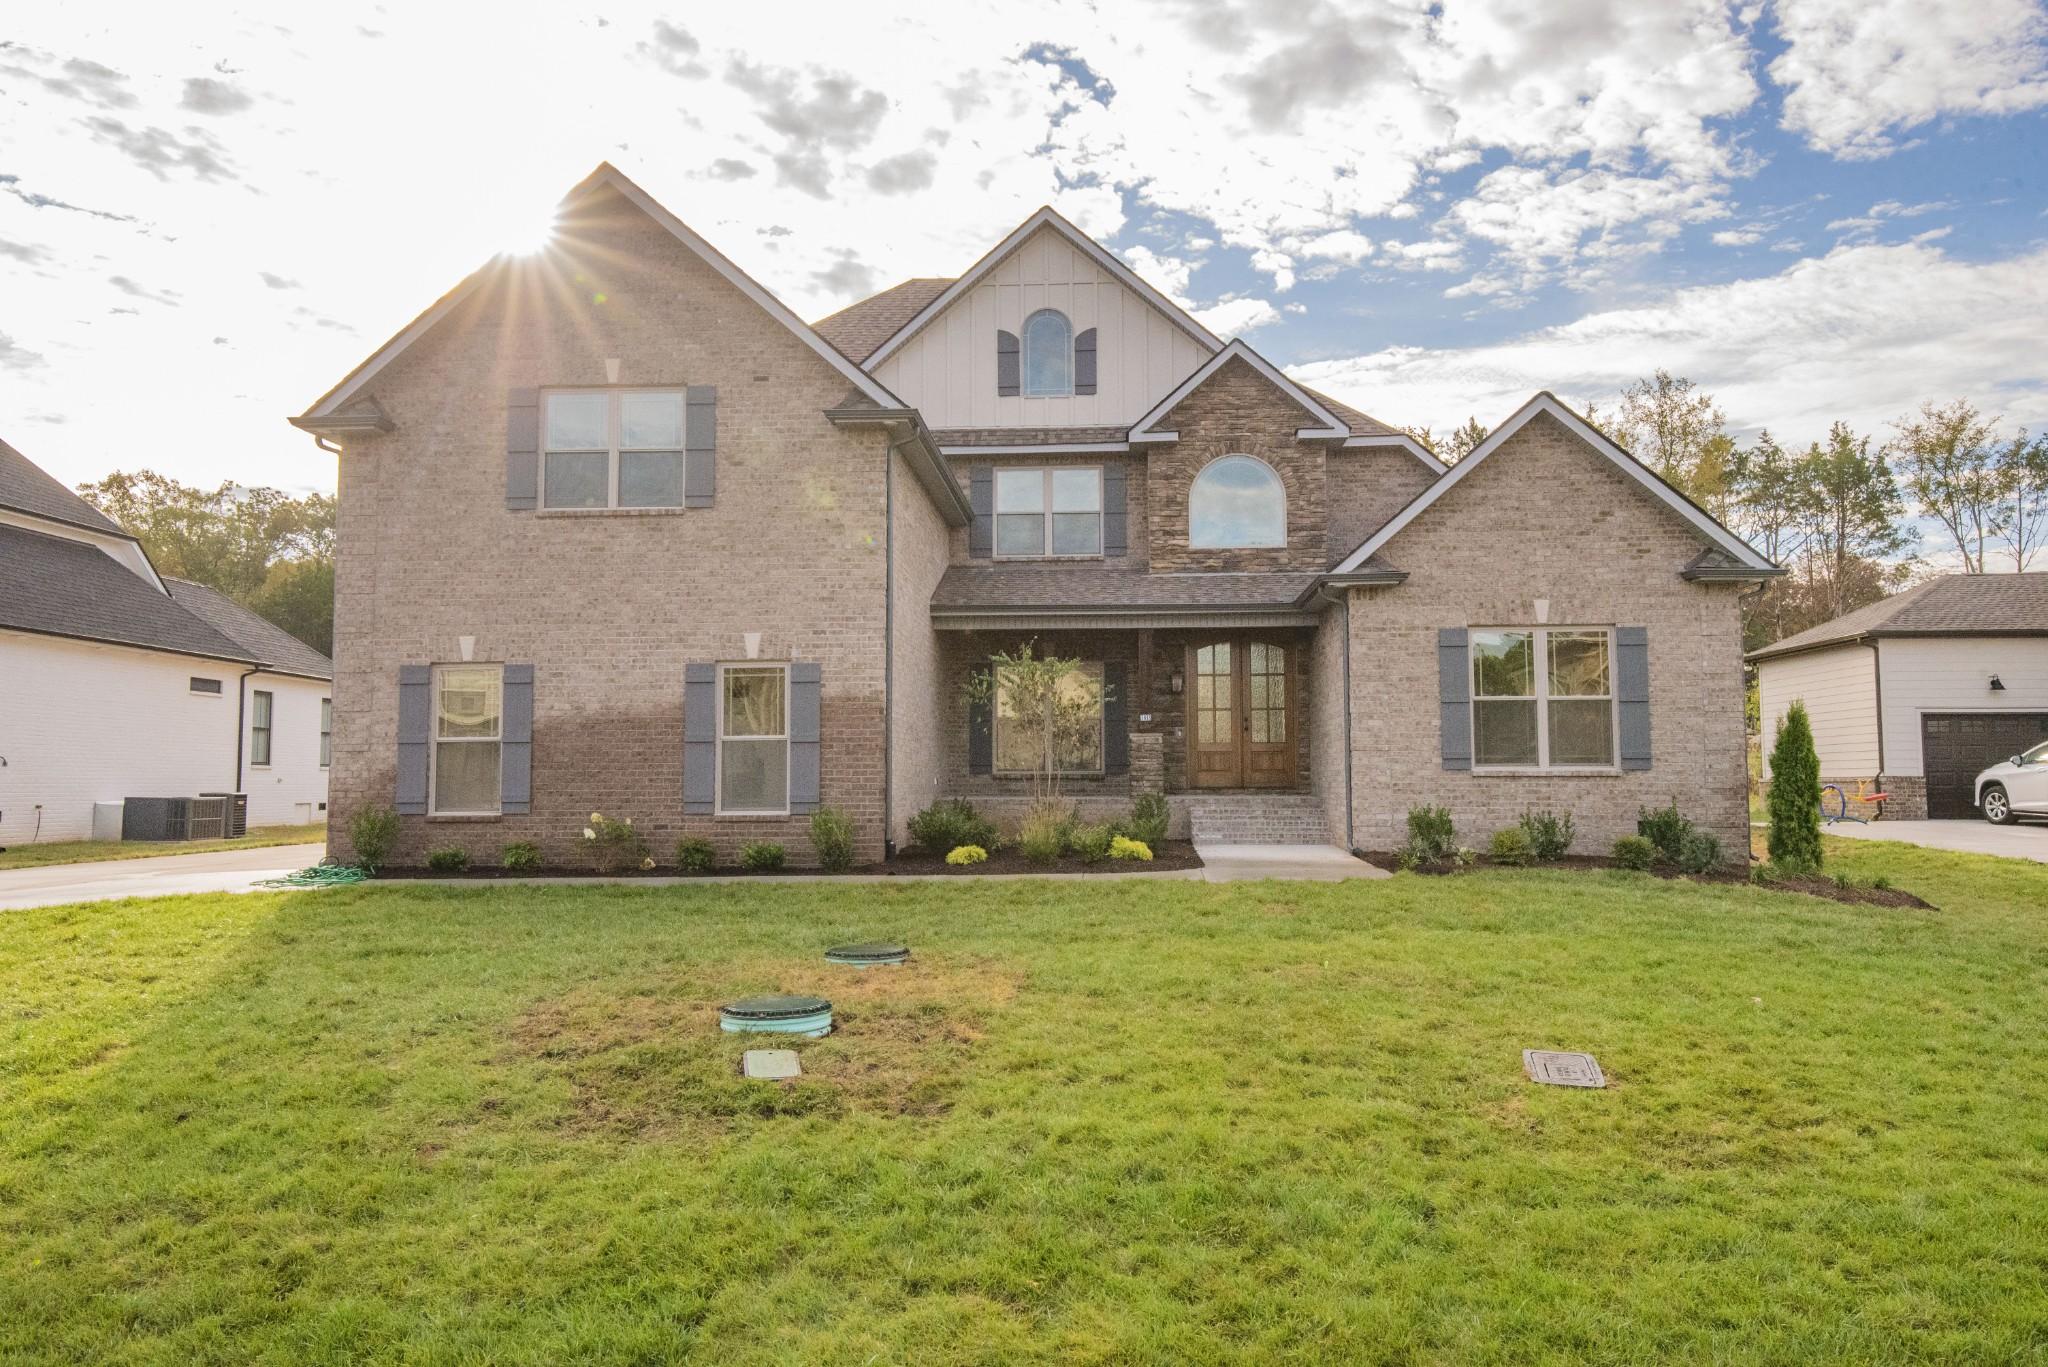 7775 Brenda Ln Property Photo - Murfreesboro, TN real estate listing